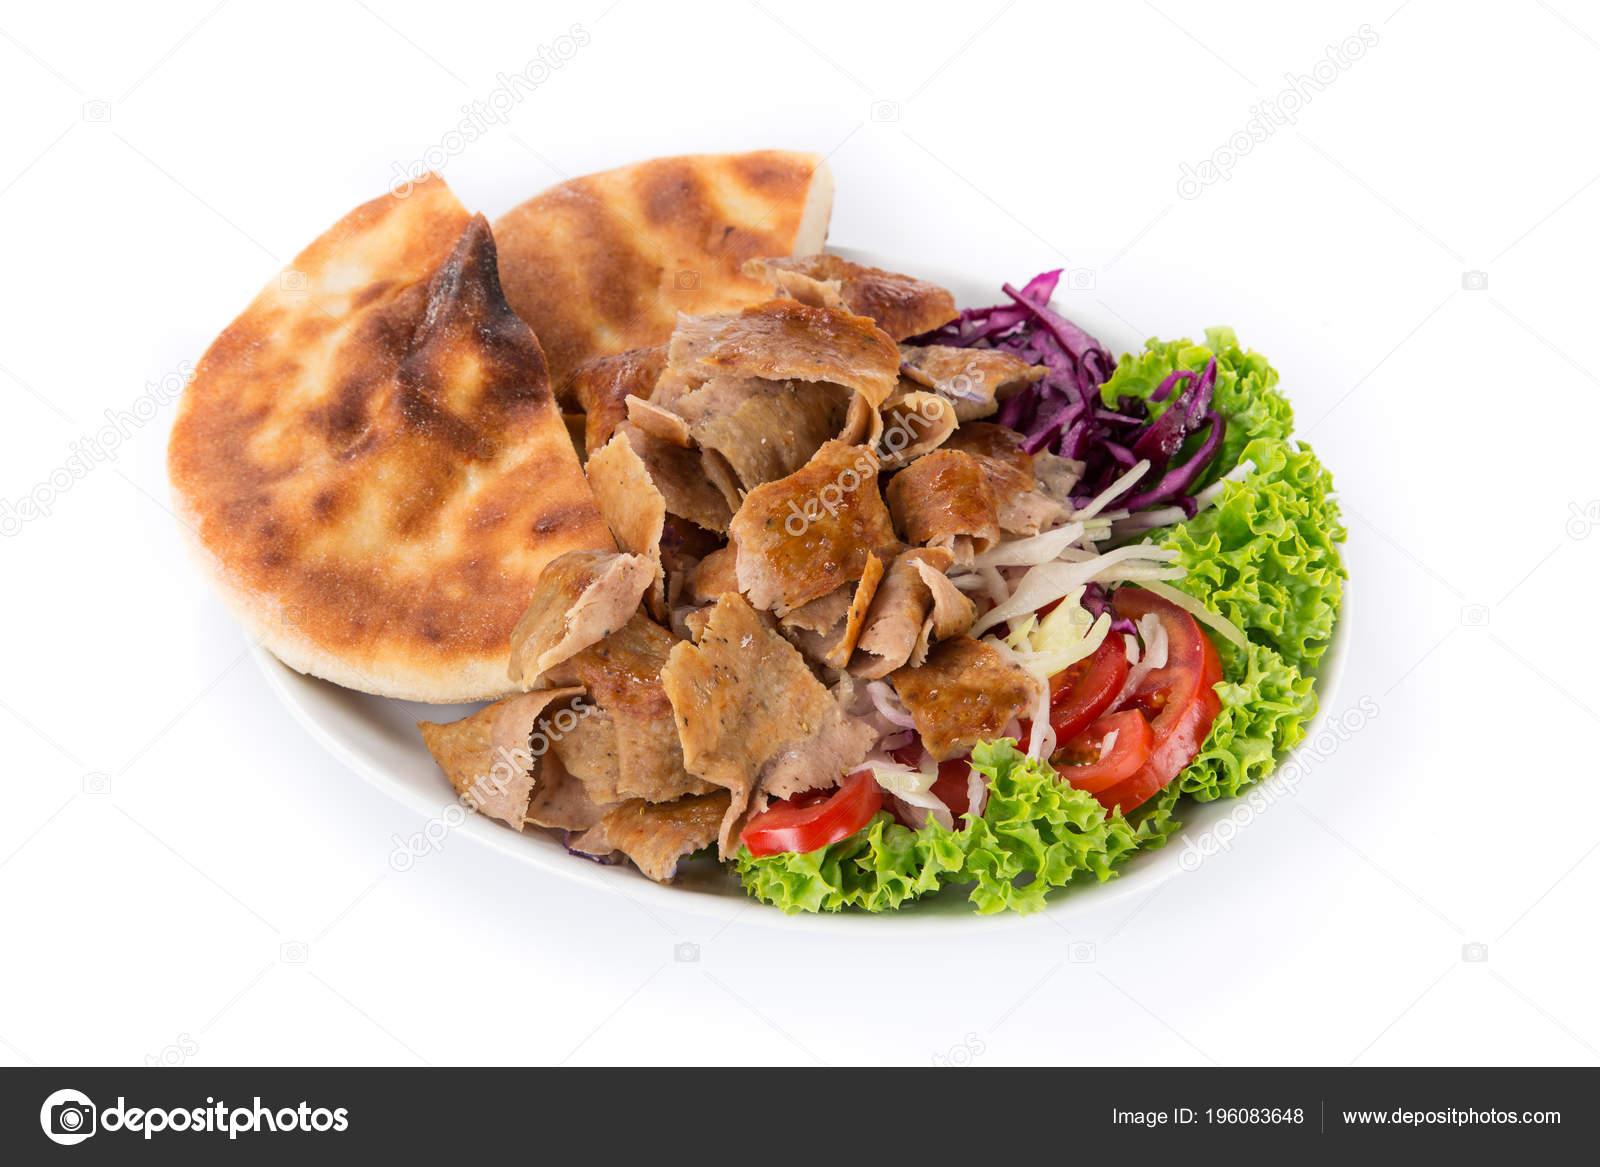 Turkish Doner Kebab Plate On White Background Stock Photo Image By C Kesu01 196083648